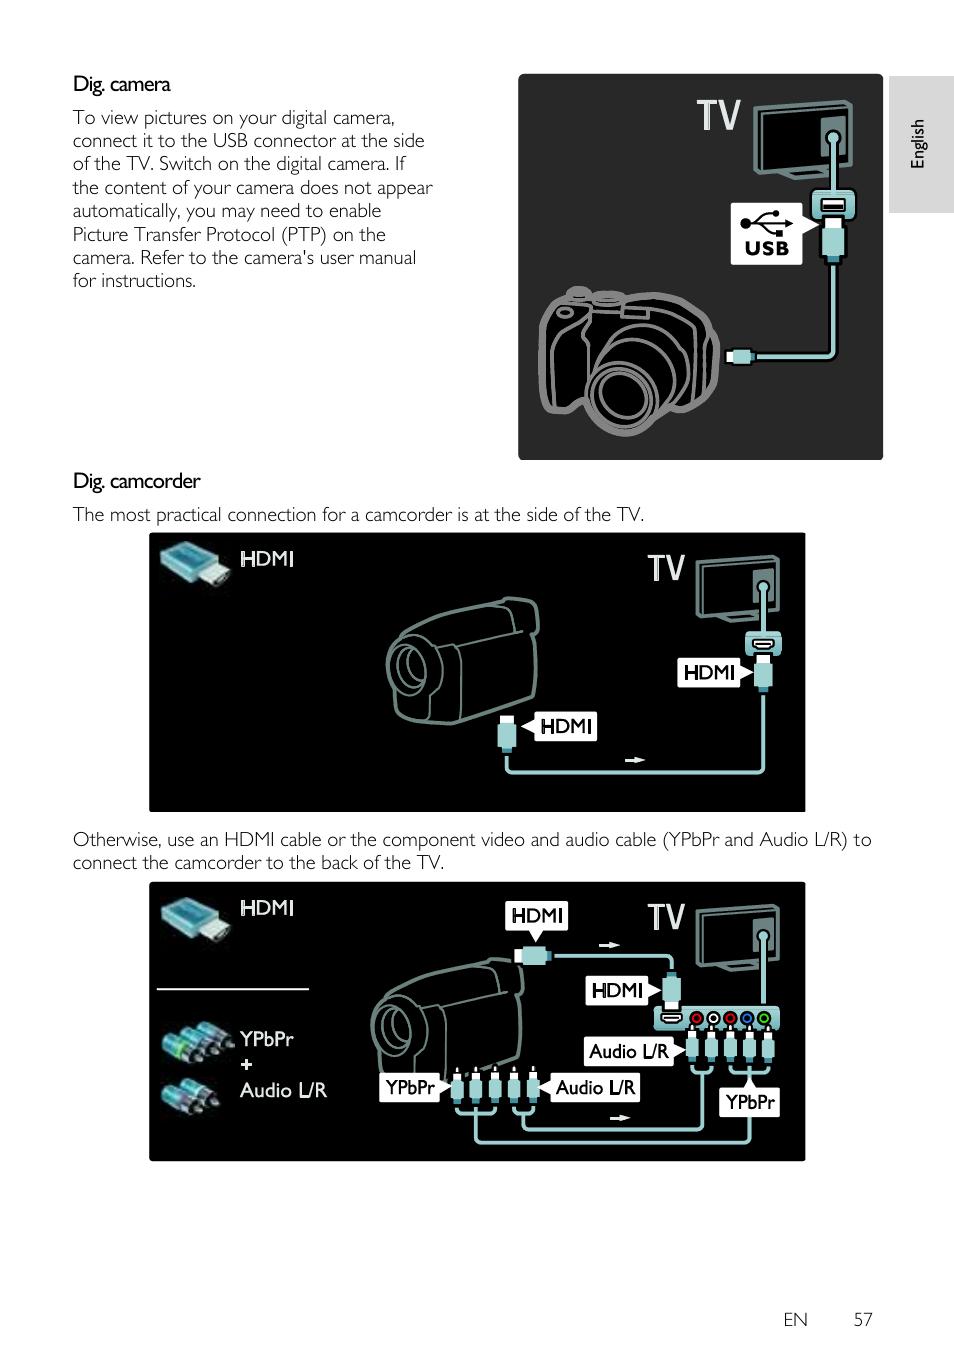 dig camera dig camcorder en 57 philips 42pfl7675h 12 user rh manualsdir com Philips Flat TV Manual Philips Universal Remote User Manual